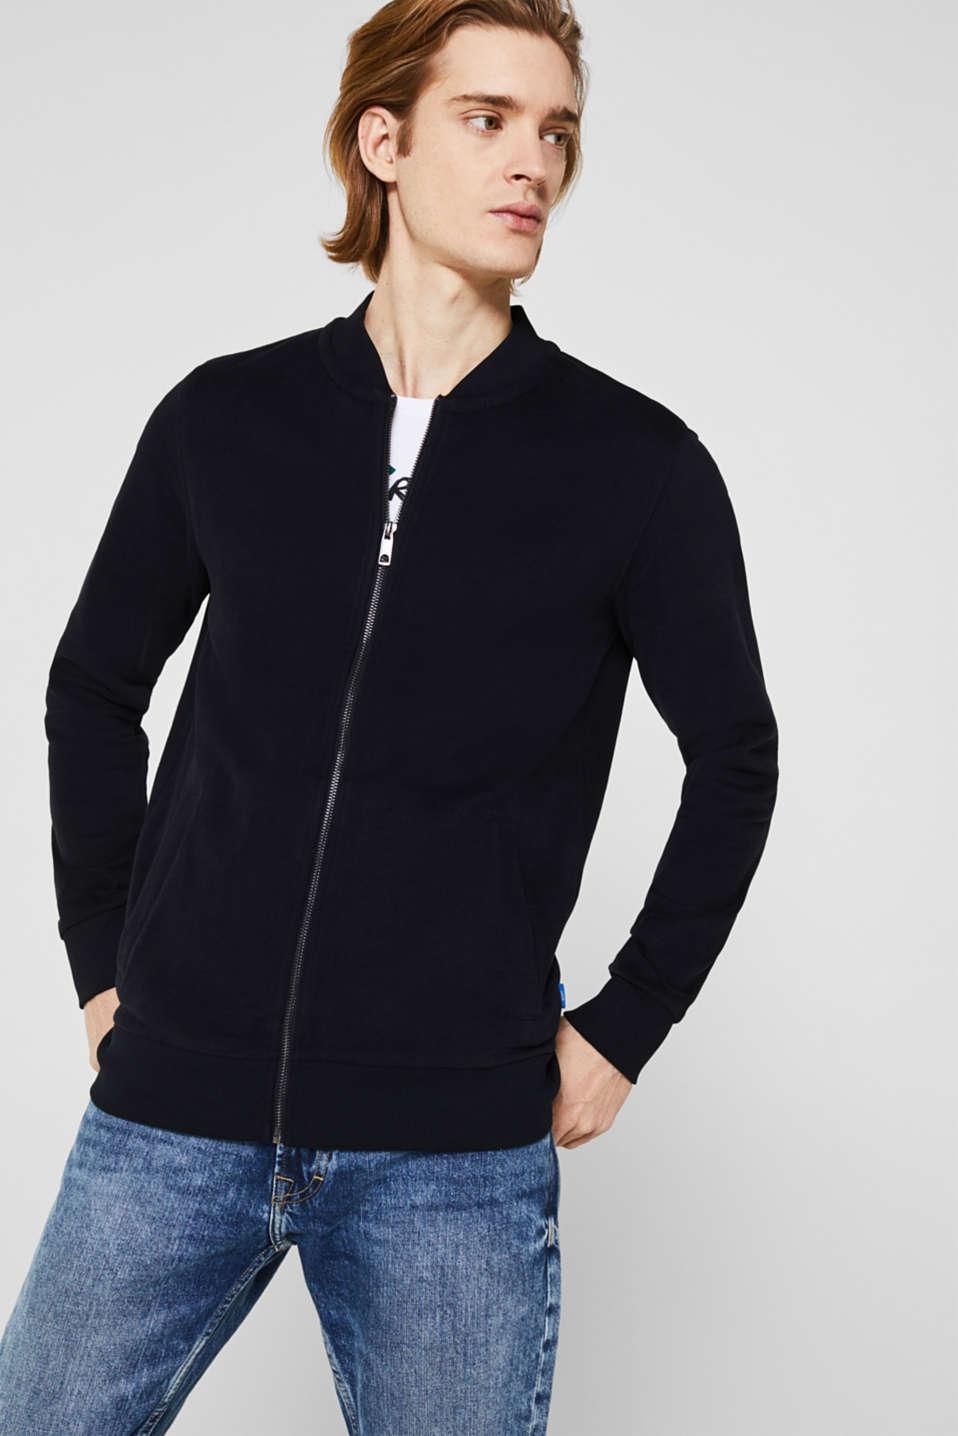 Bomber-style sweatshirt jacket, 100% cotton